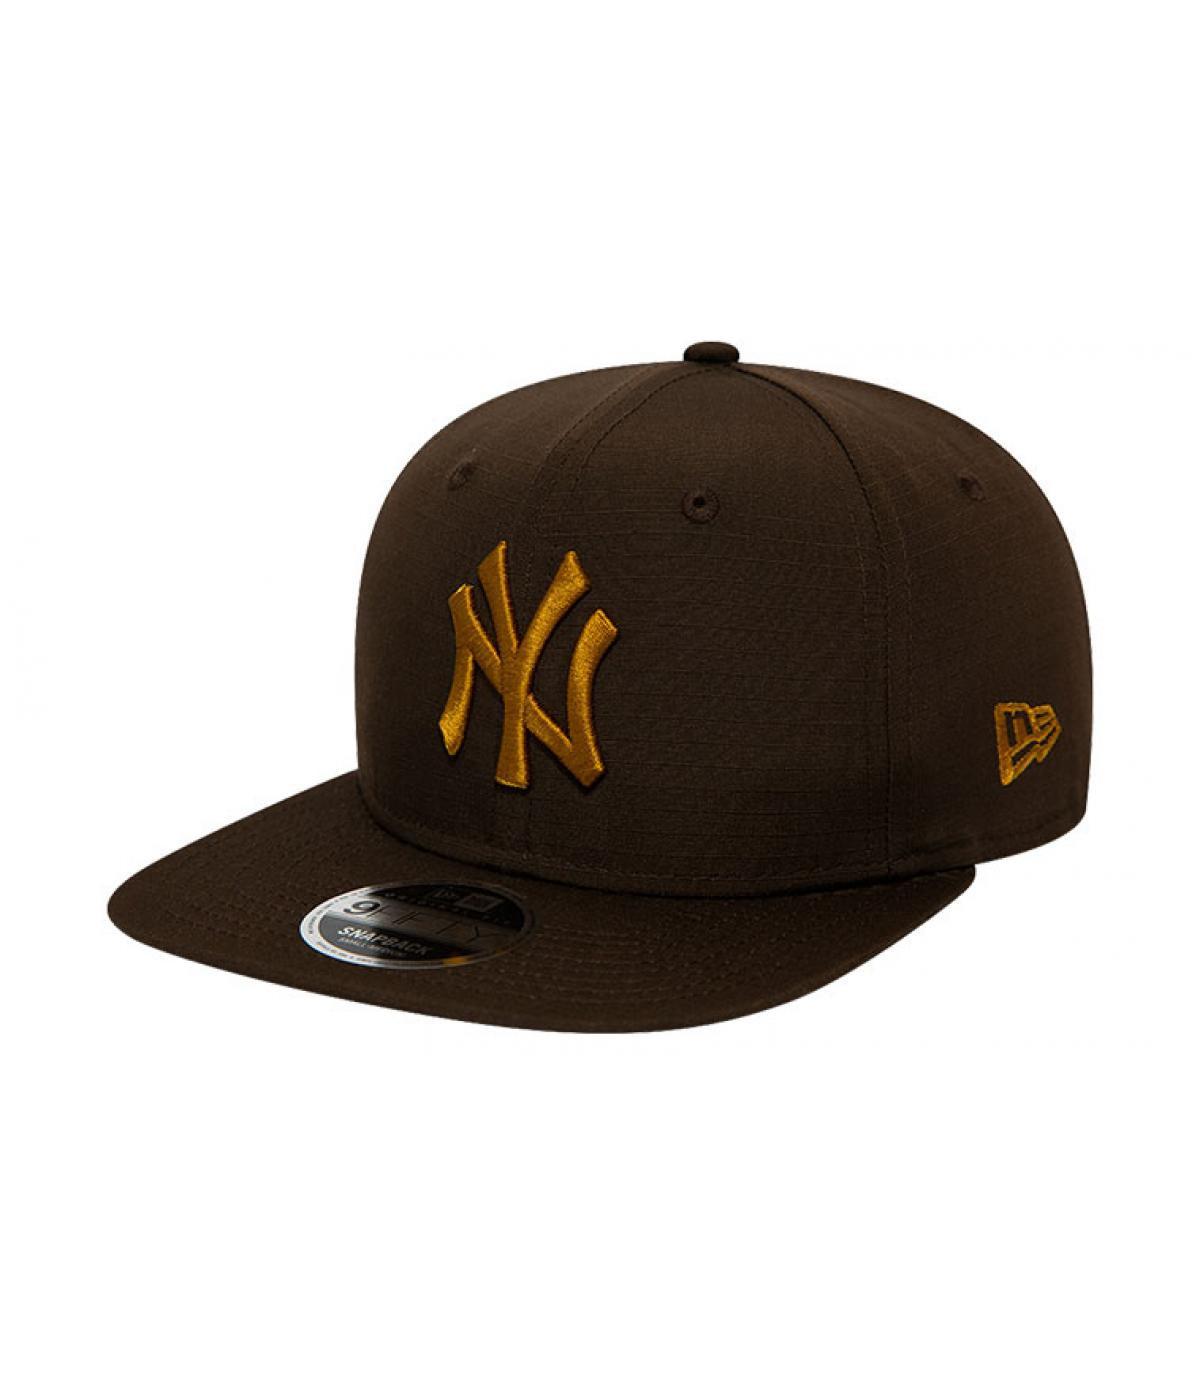 Details Snapback MLB Utility NY 950 brown old gold - Abbildung 2